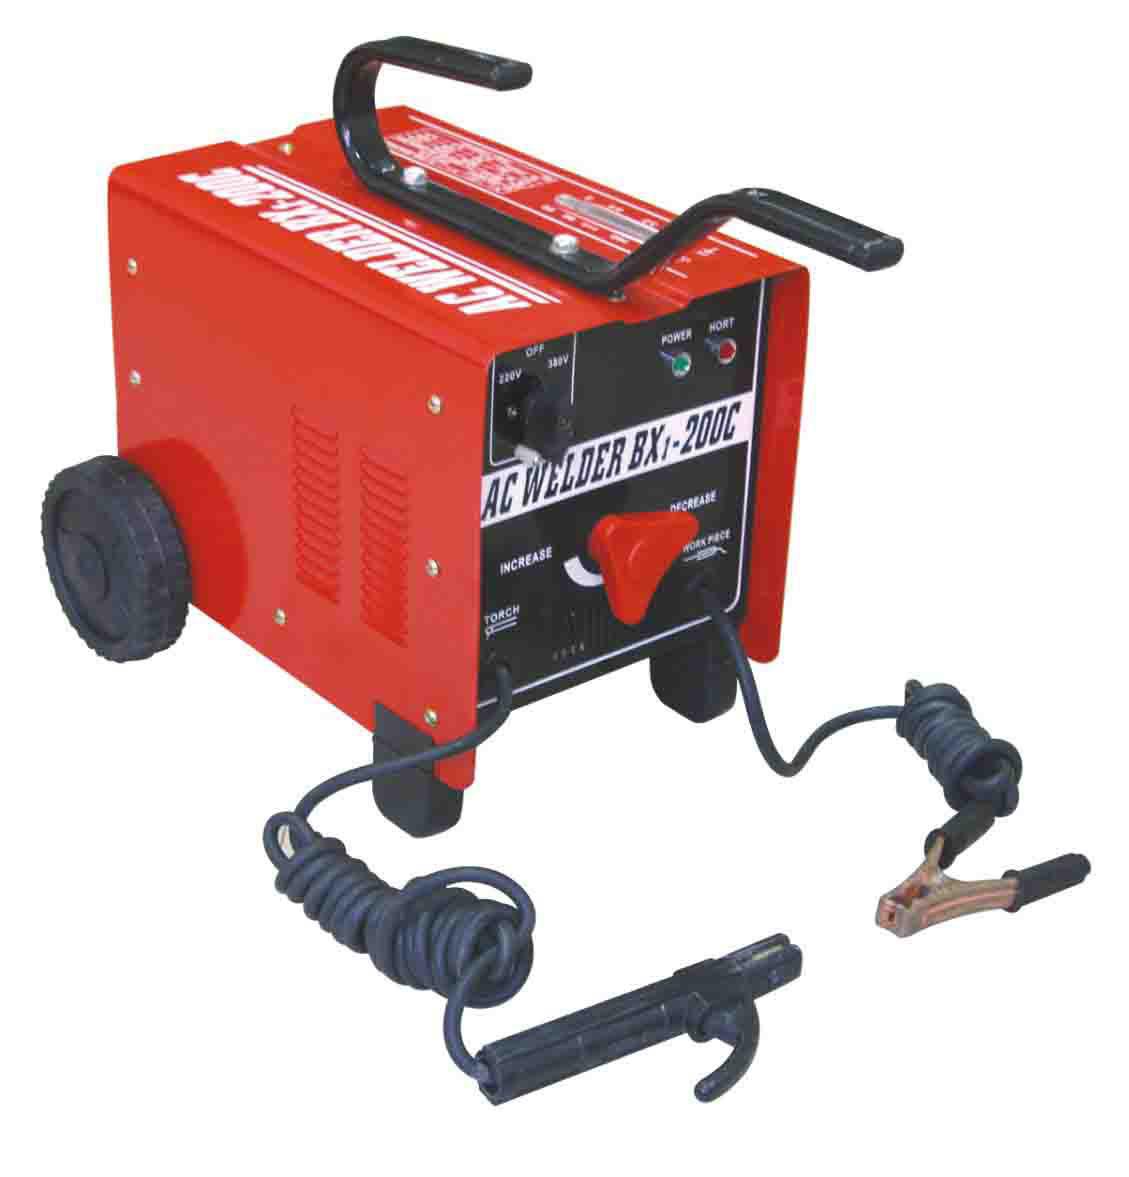 Ac welder bx1 200c схема